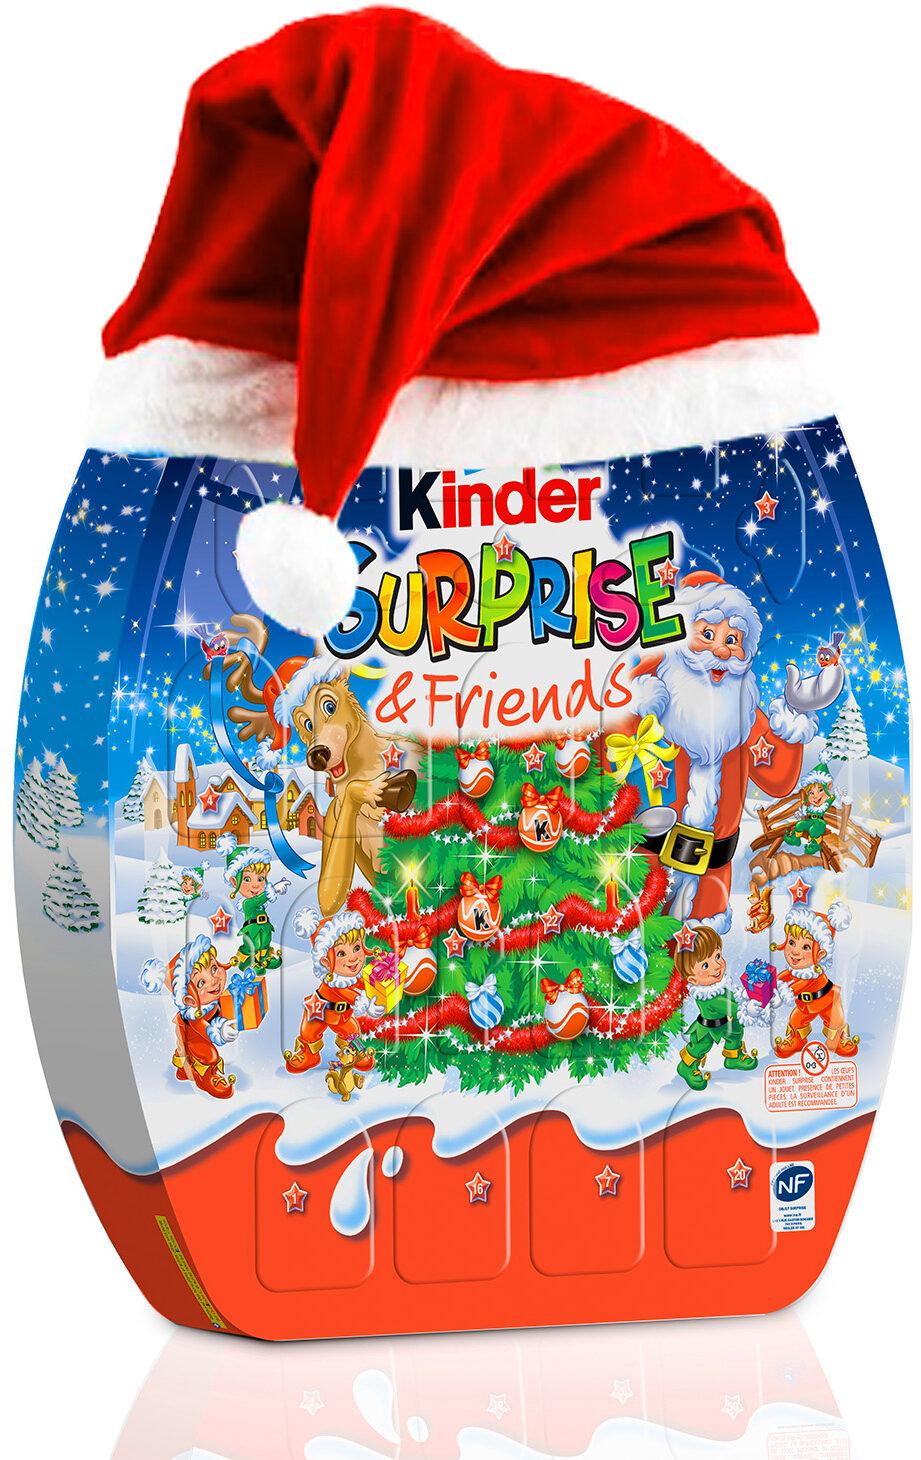 Kinder Weihnachtskalender.Kinder überraschung Friends Adventskalender 431 G